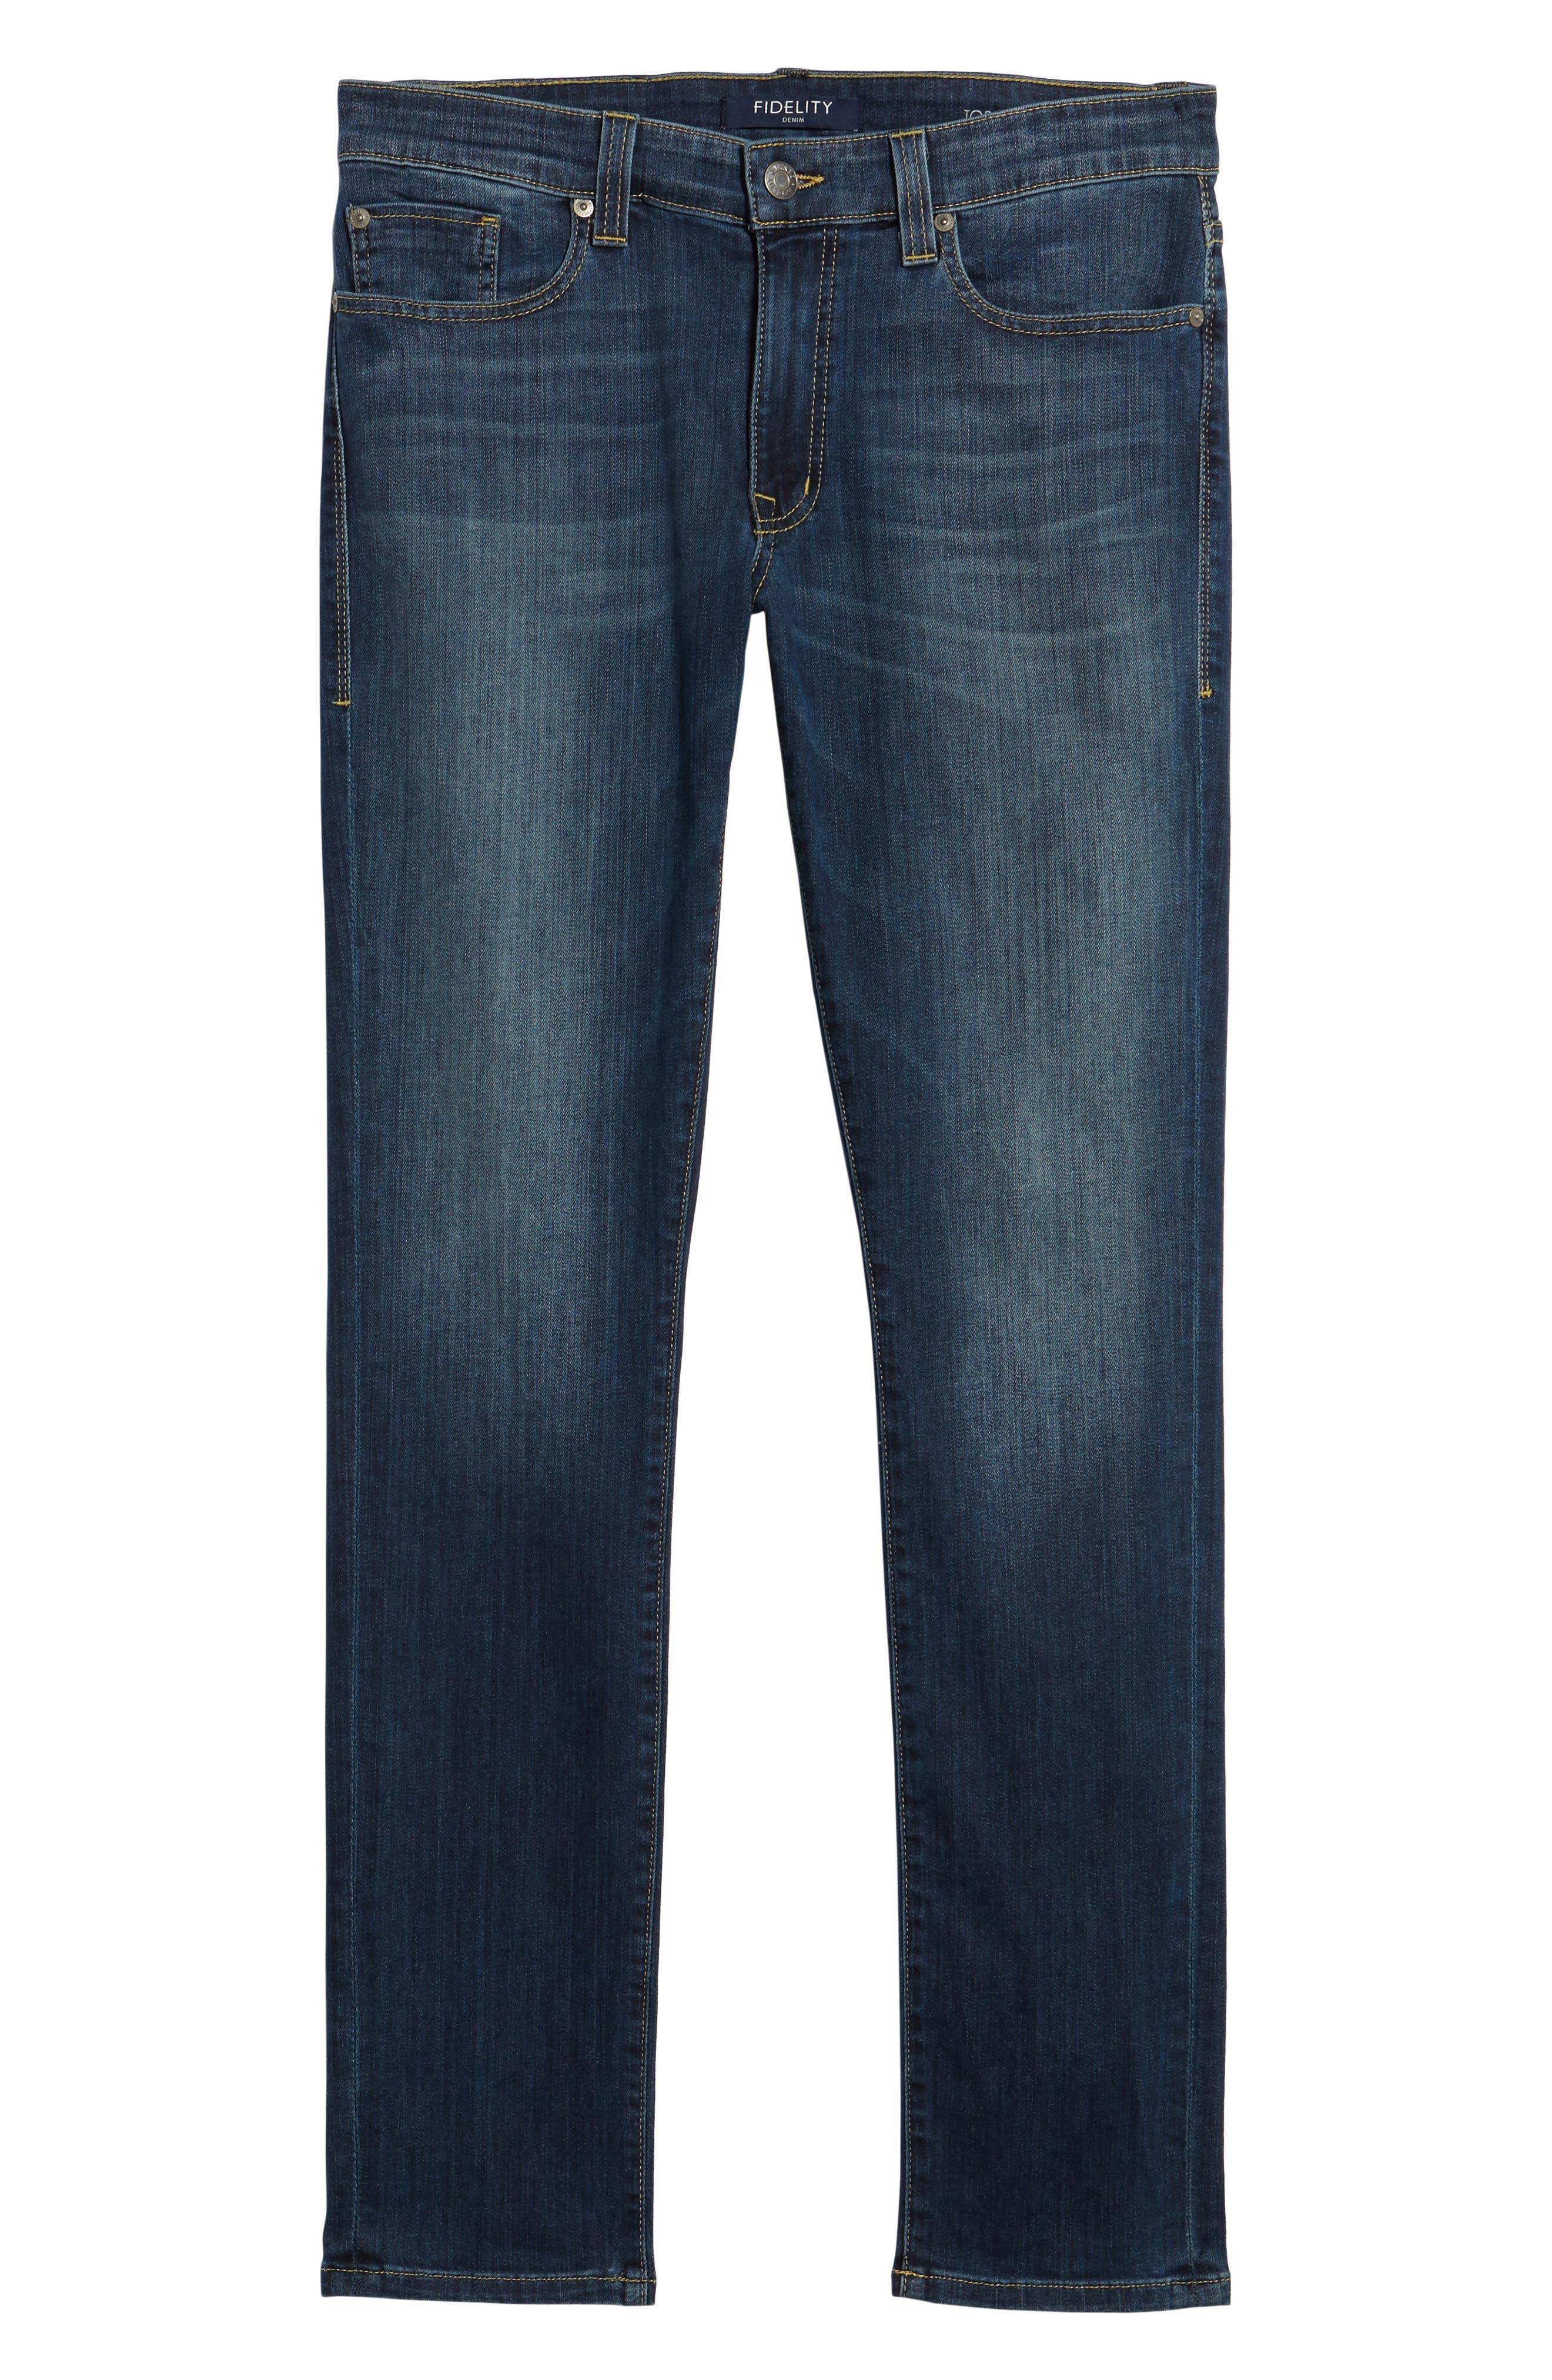 Torino Slim Fit Jeans,                             Alternate thumbnail 6, color,                             400